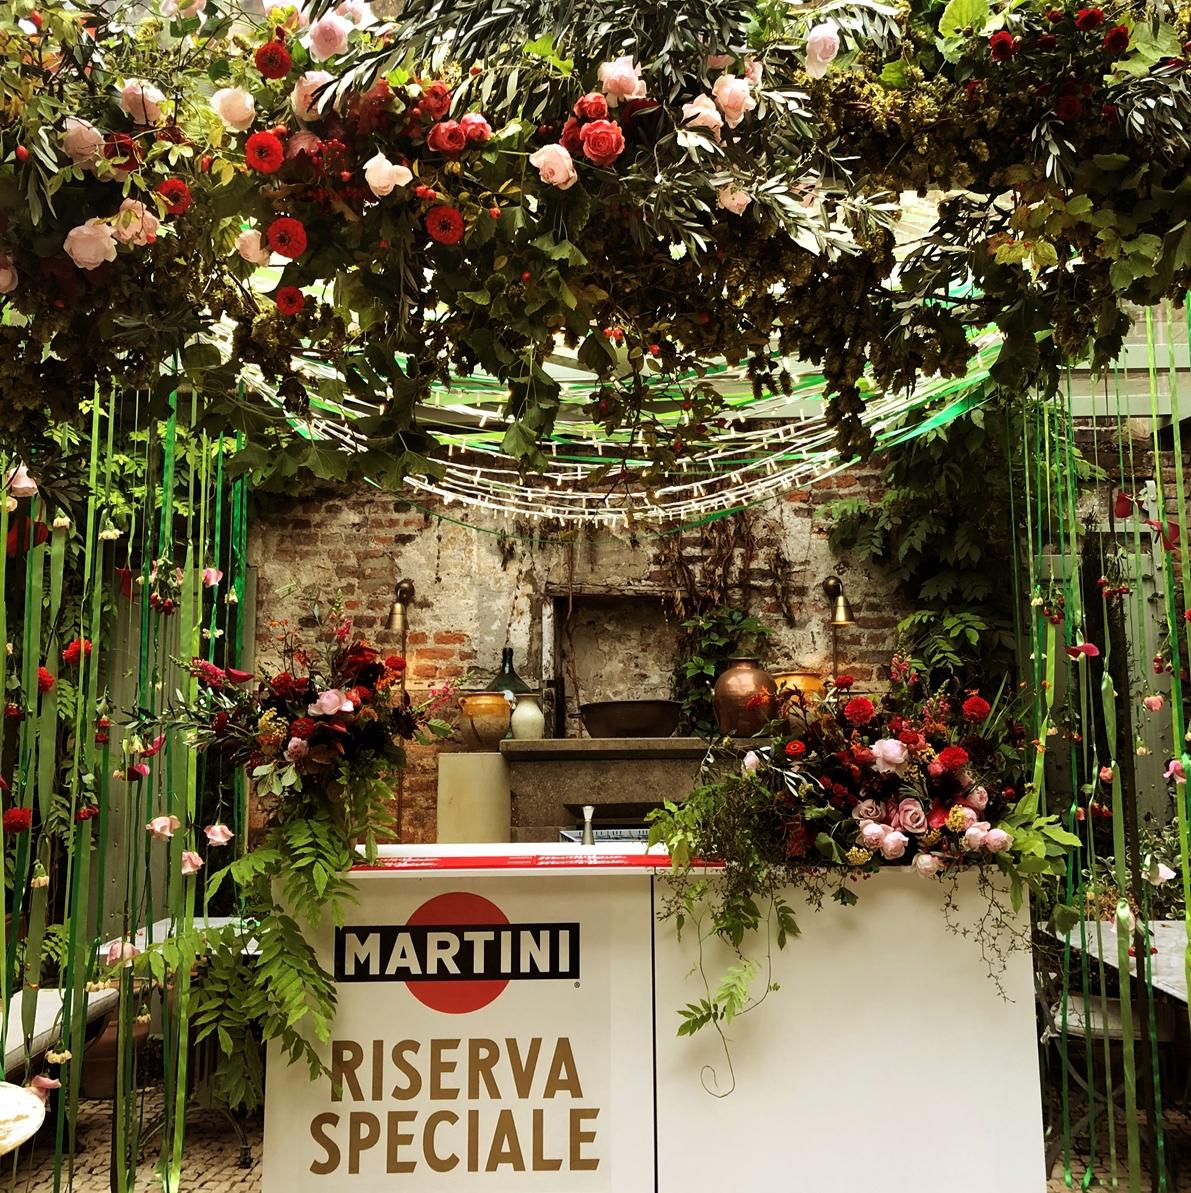 Martini event 2.jpg